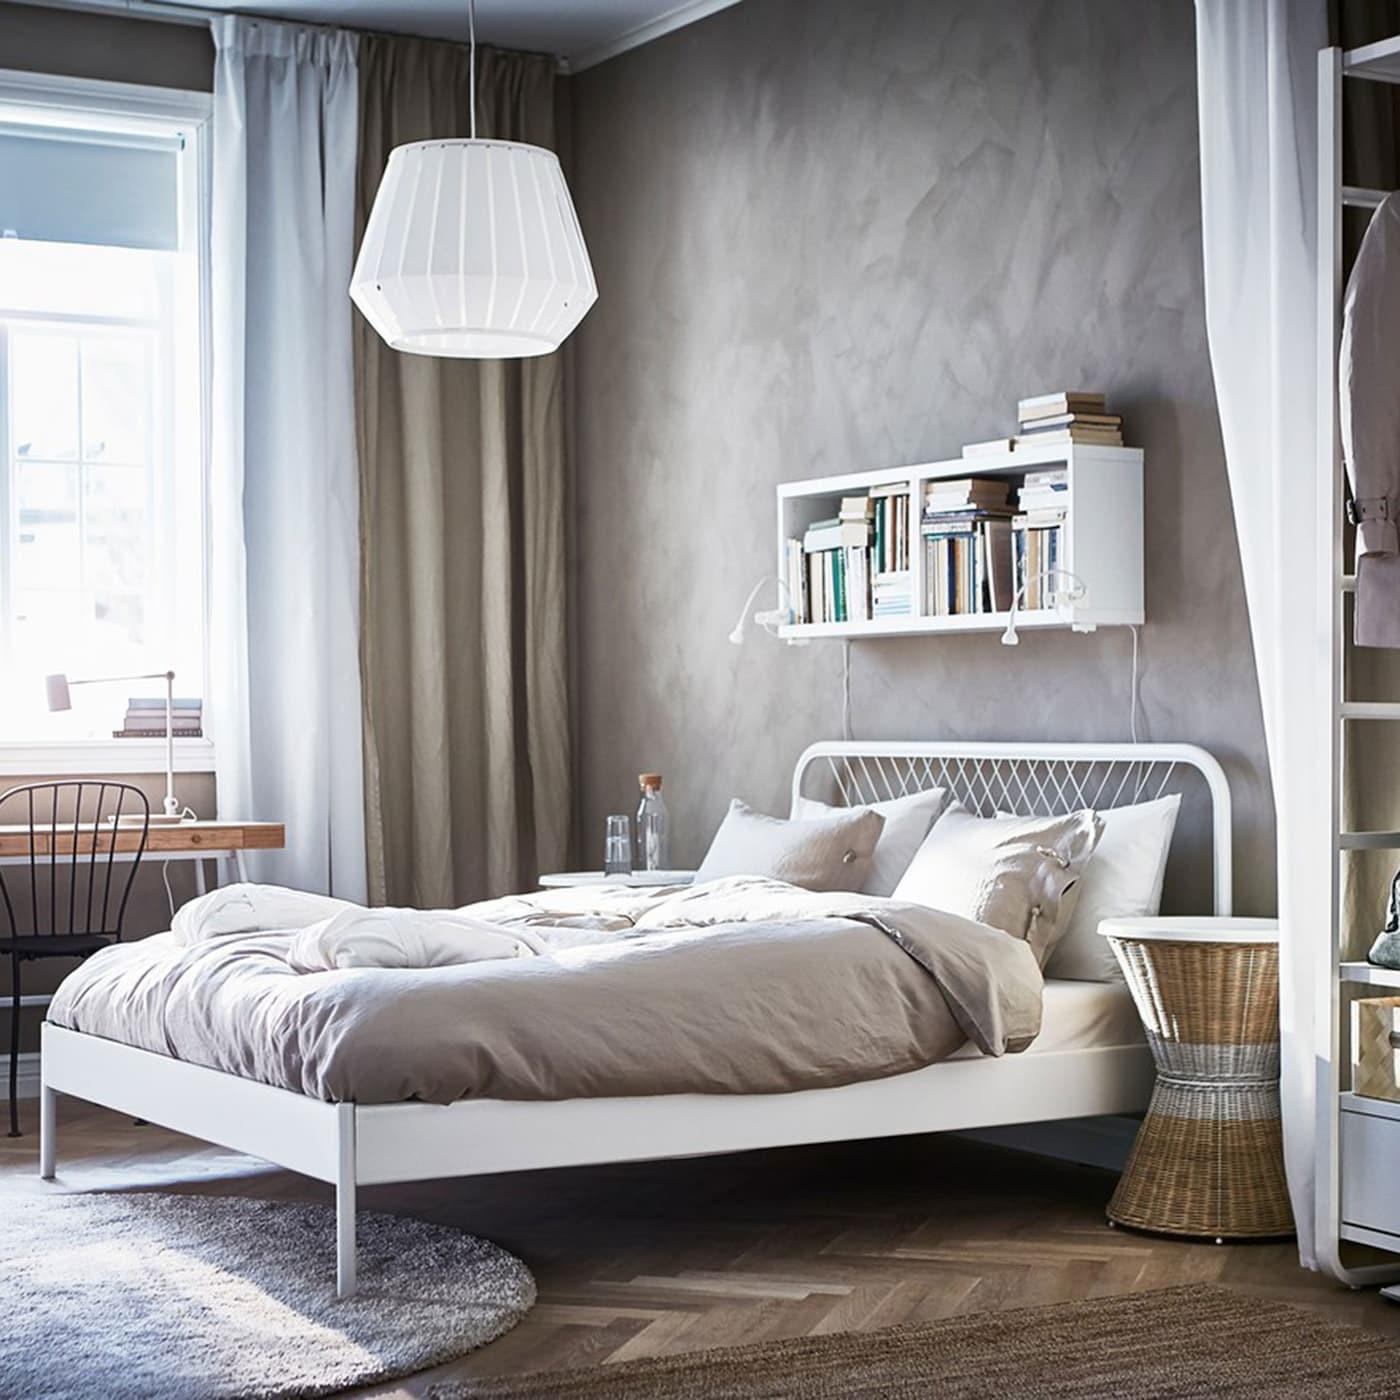 White Scandinavian styled IKEA NESTTUN wired bedframe in a crisp room with beige walls and an open air wardrobe.